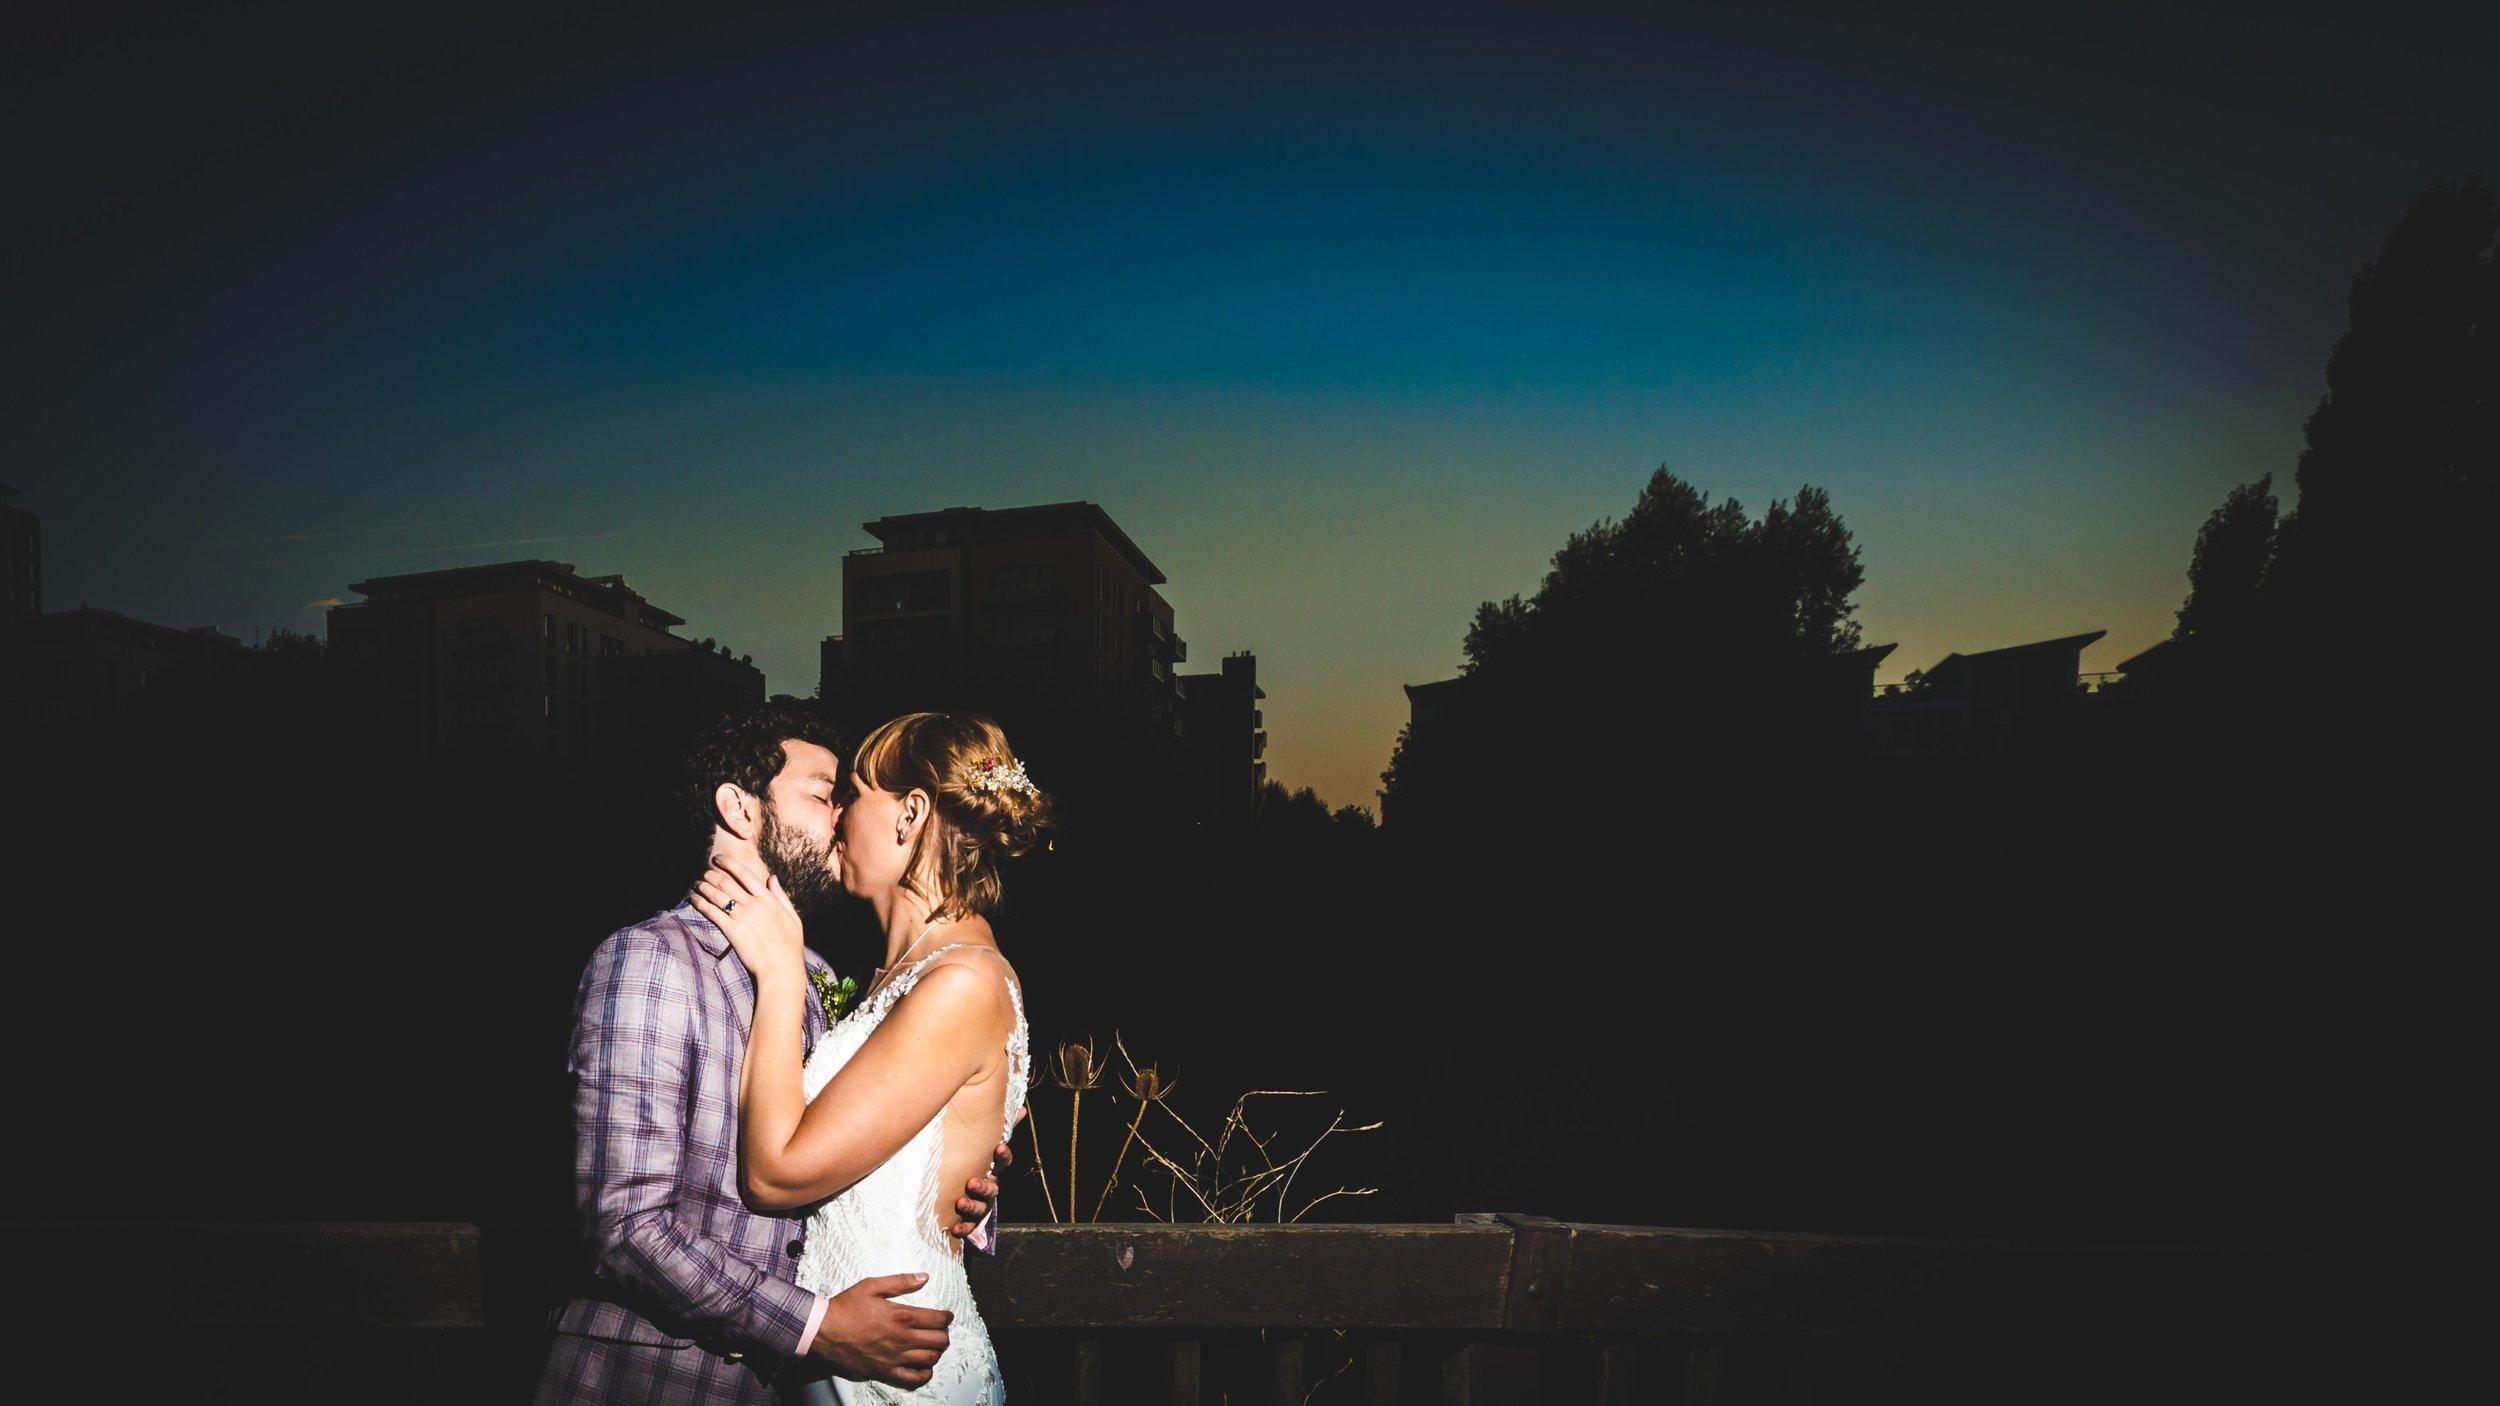 Bride and groom, night sky